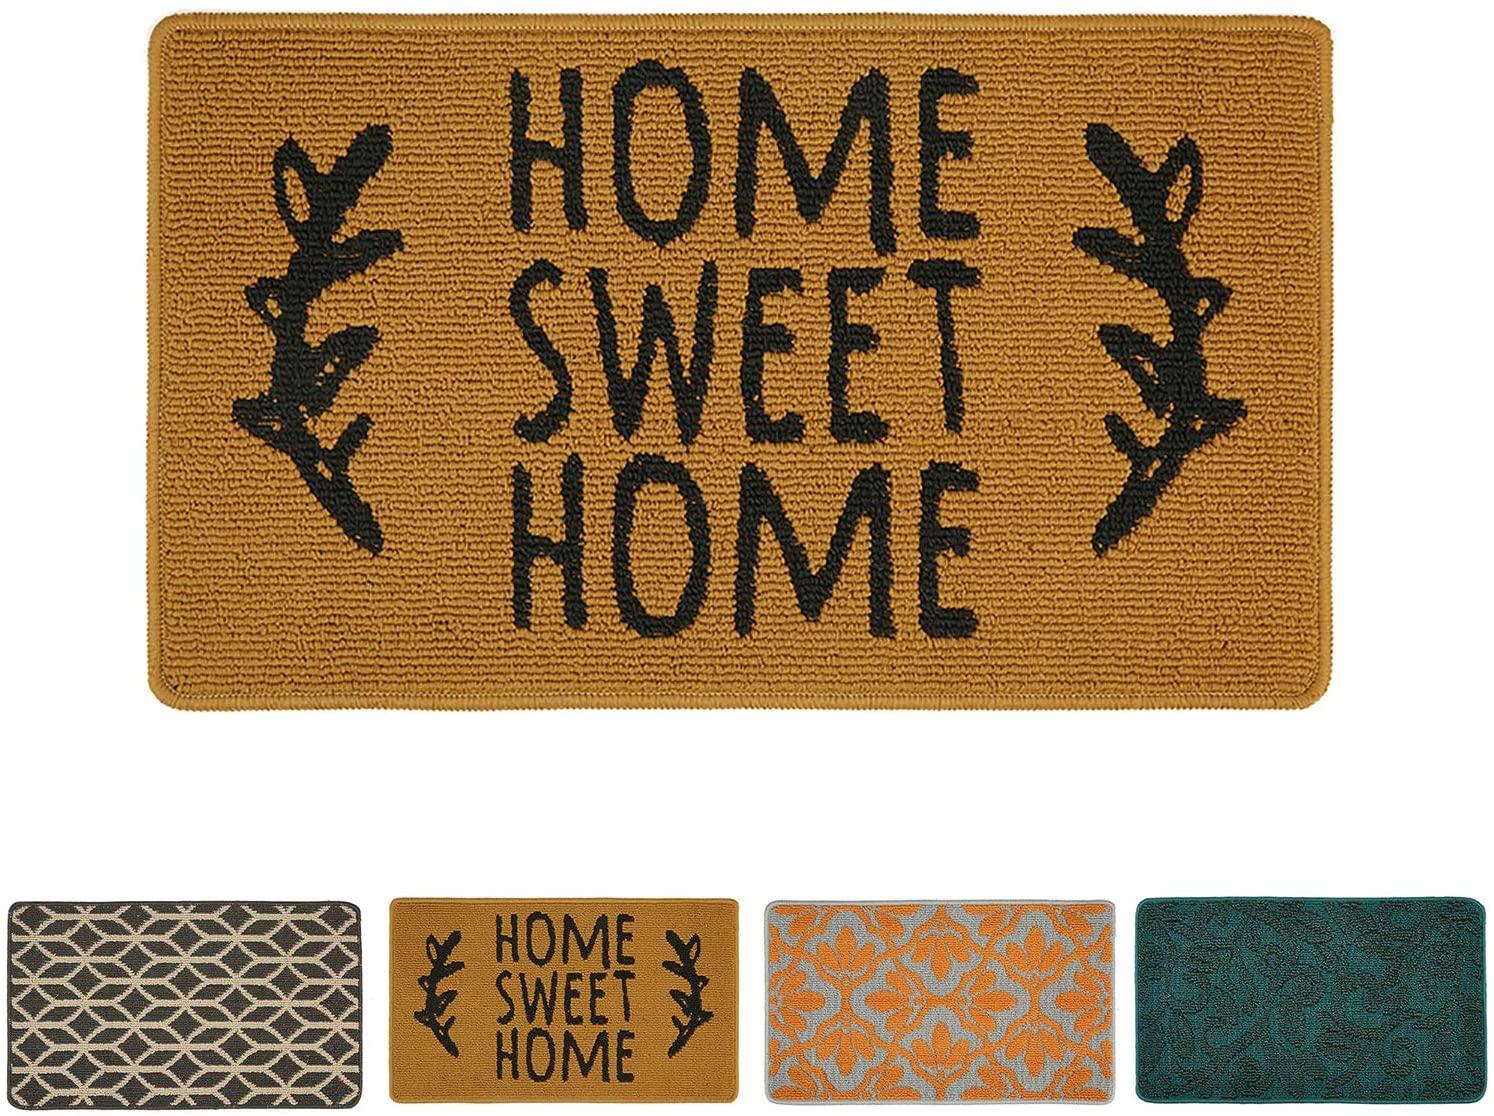 Doormat Outdoor Indoor Home Mat Non Slip Waterproof Washable Quickly Absorb Moisture and Resist Dirt Rugs for Door Entrance, Kitchen, Flat and Office (17